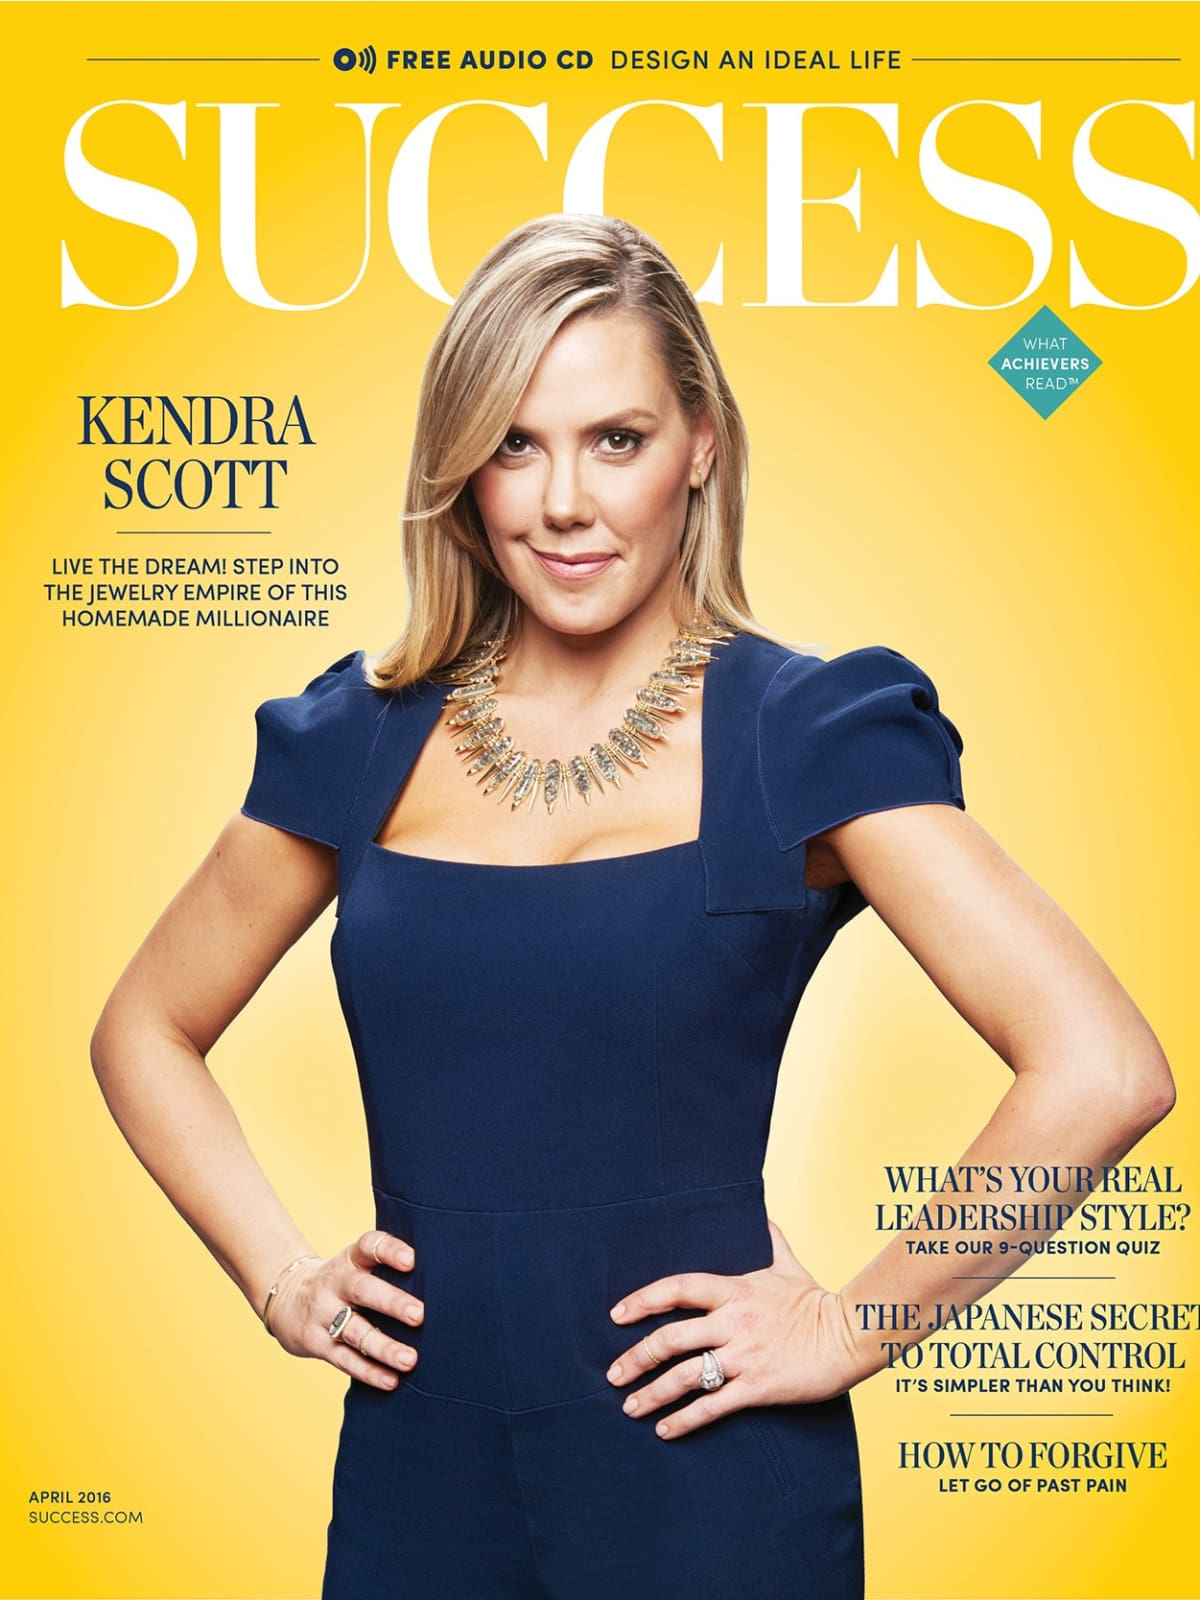 Kendra Scott on cover of Success magazine